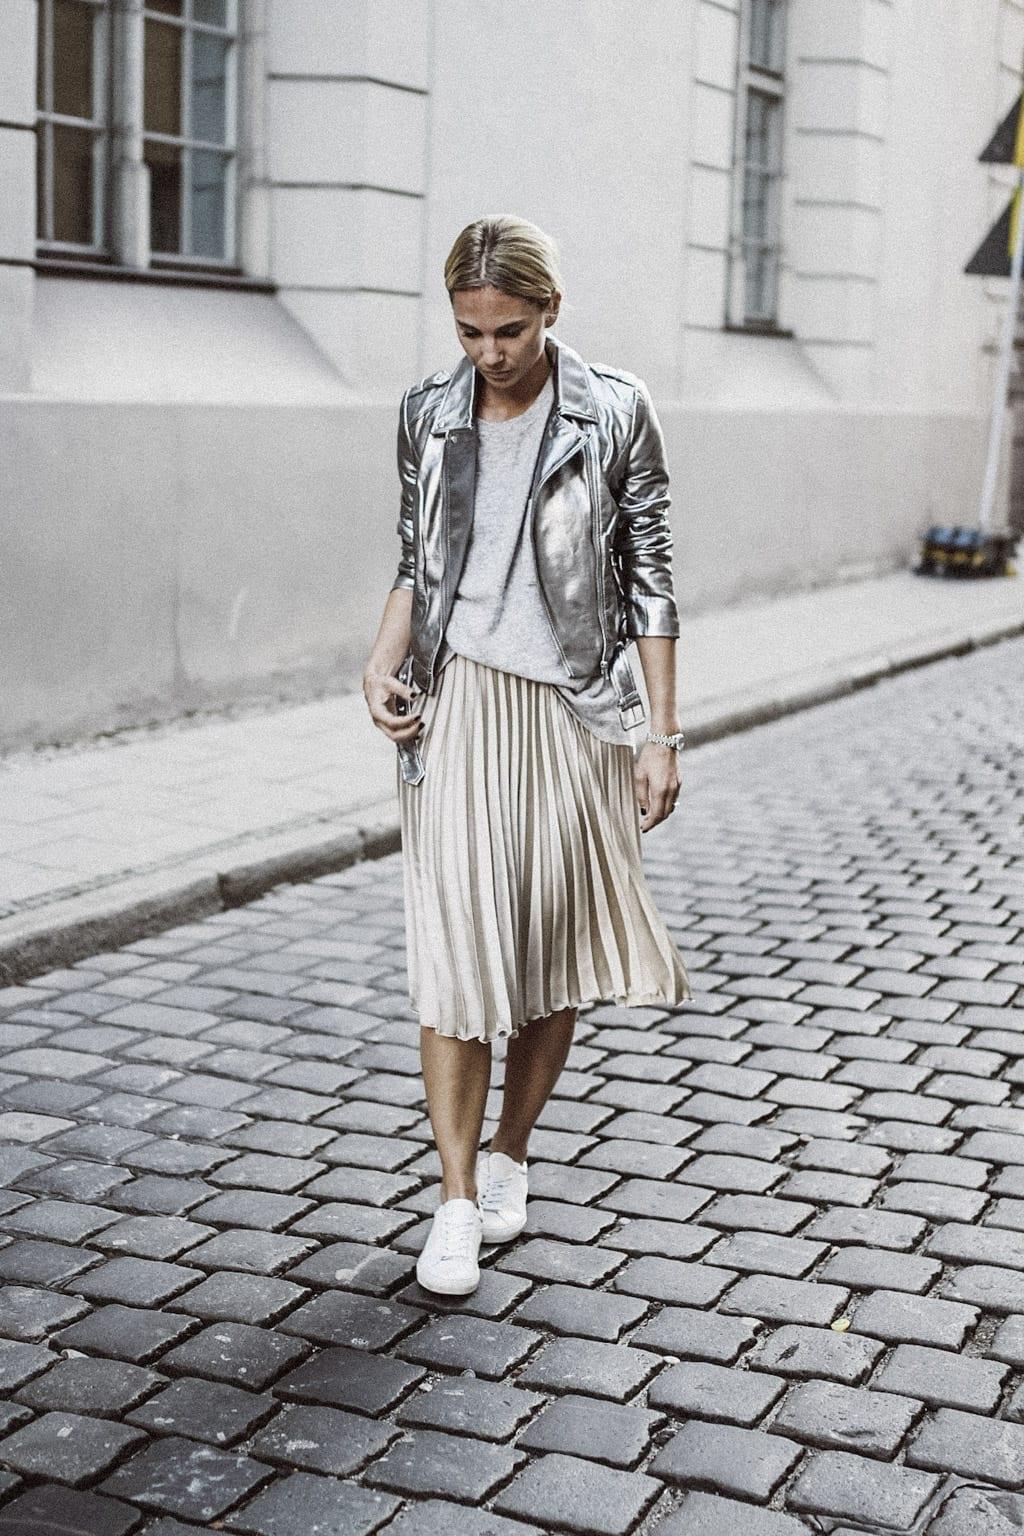 ck-constantlyk-com-karin-kaswurm-street-style-fashion-silver-leather-jacket-plissee-6792